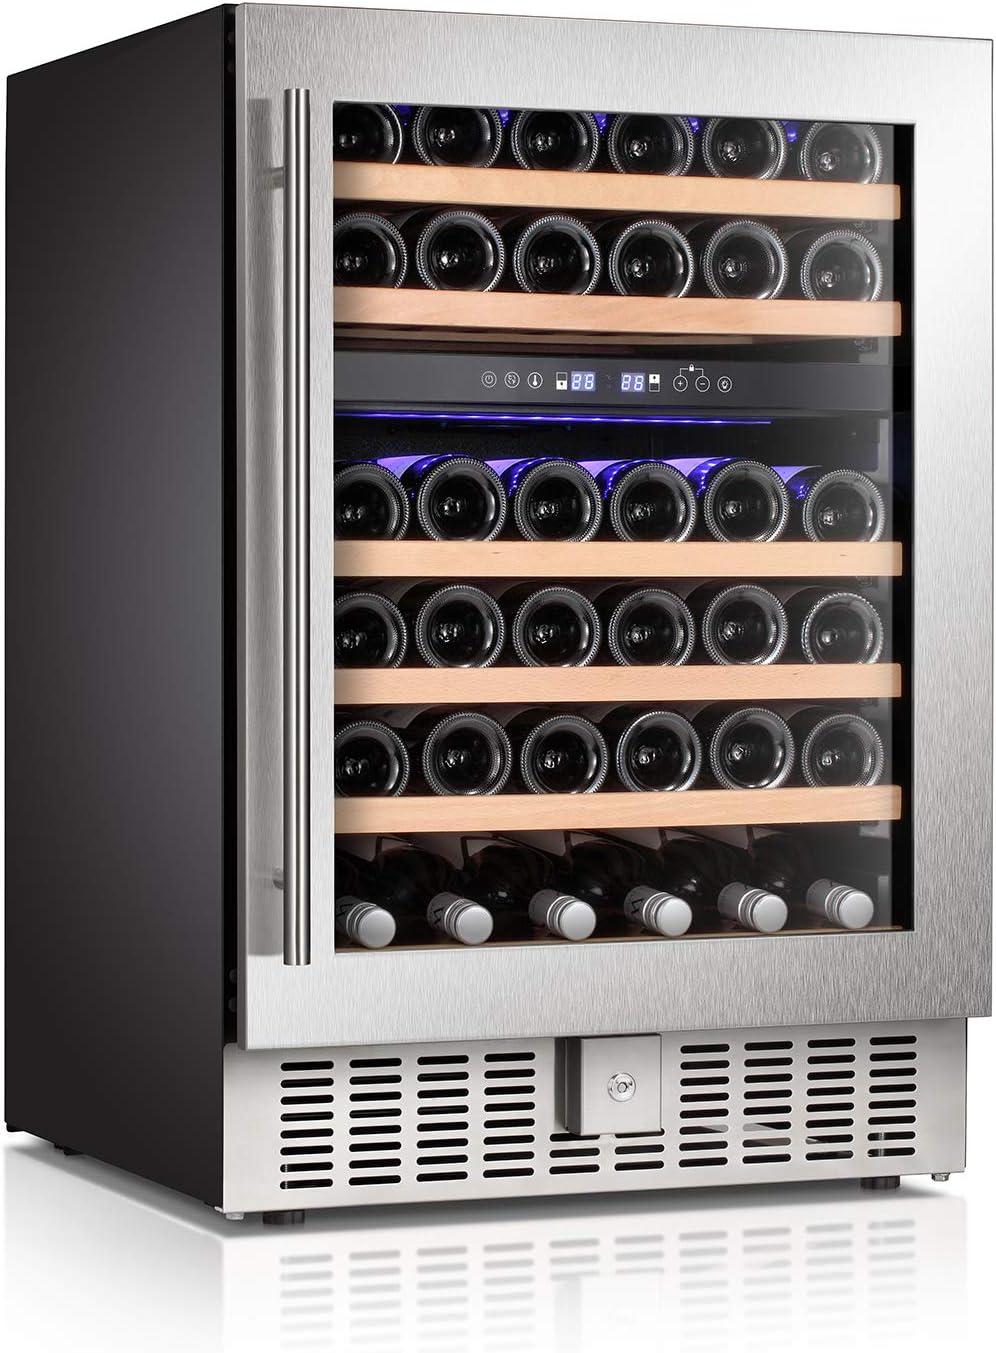 Antarctic Star Wine Cooler Refrigerator Fridge 46 Bottles Dual Zone Wine Cellar Built-in Freestanding Wine Chiller with Stainless Steel &Digital Memory Temperature Control/Wood Shelves/Silver